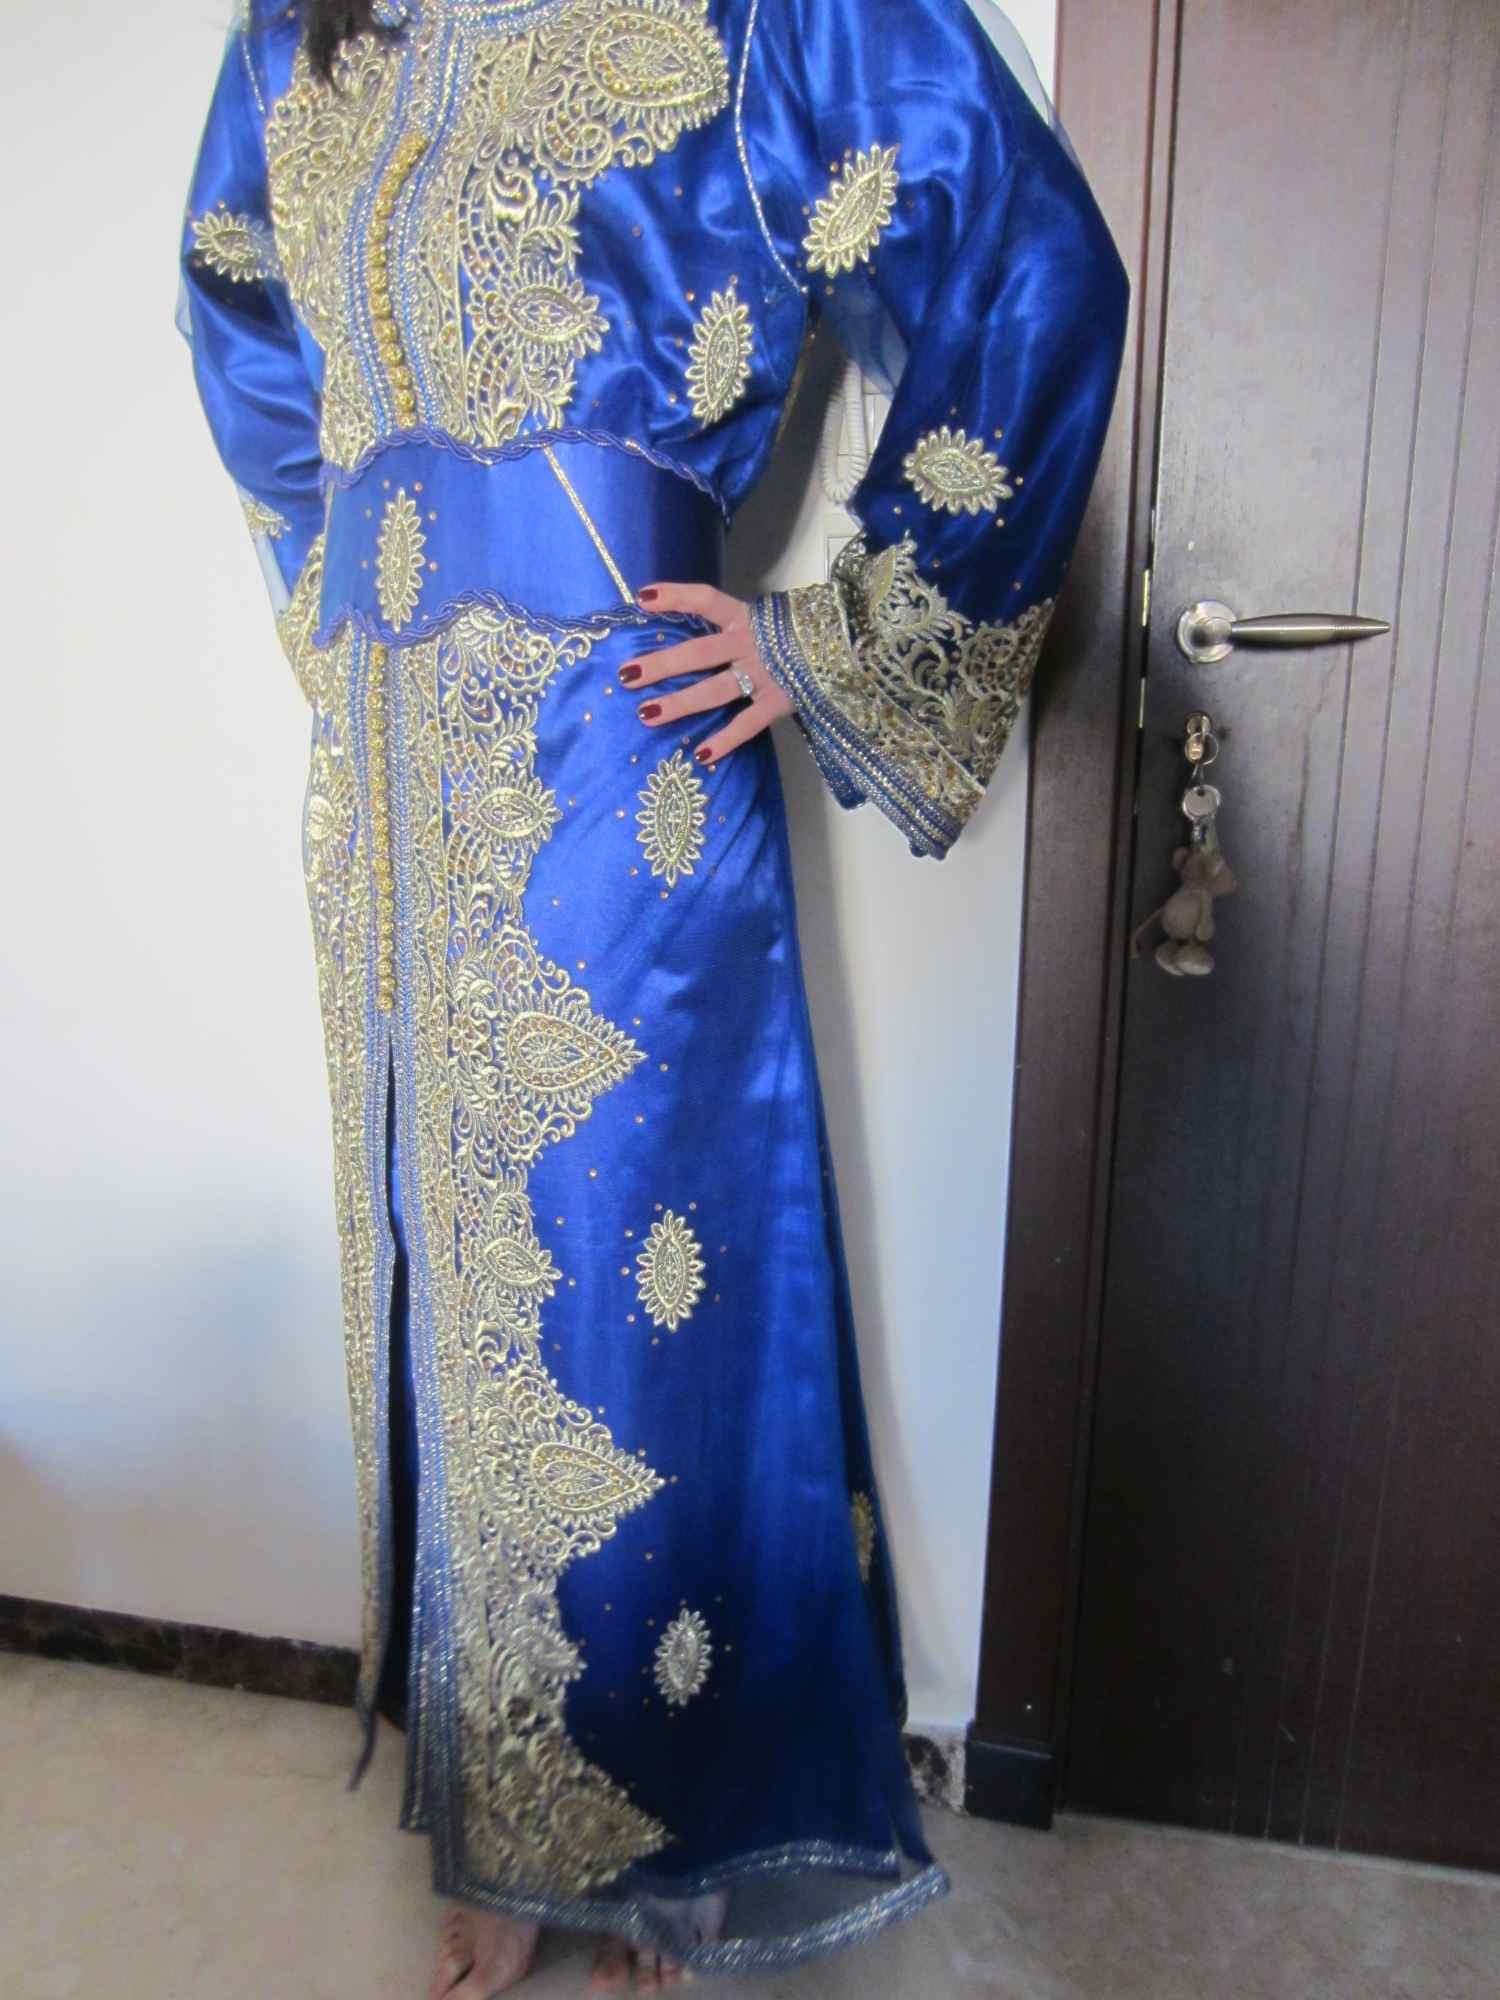 Caut femeie marocana